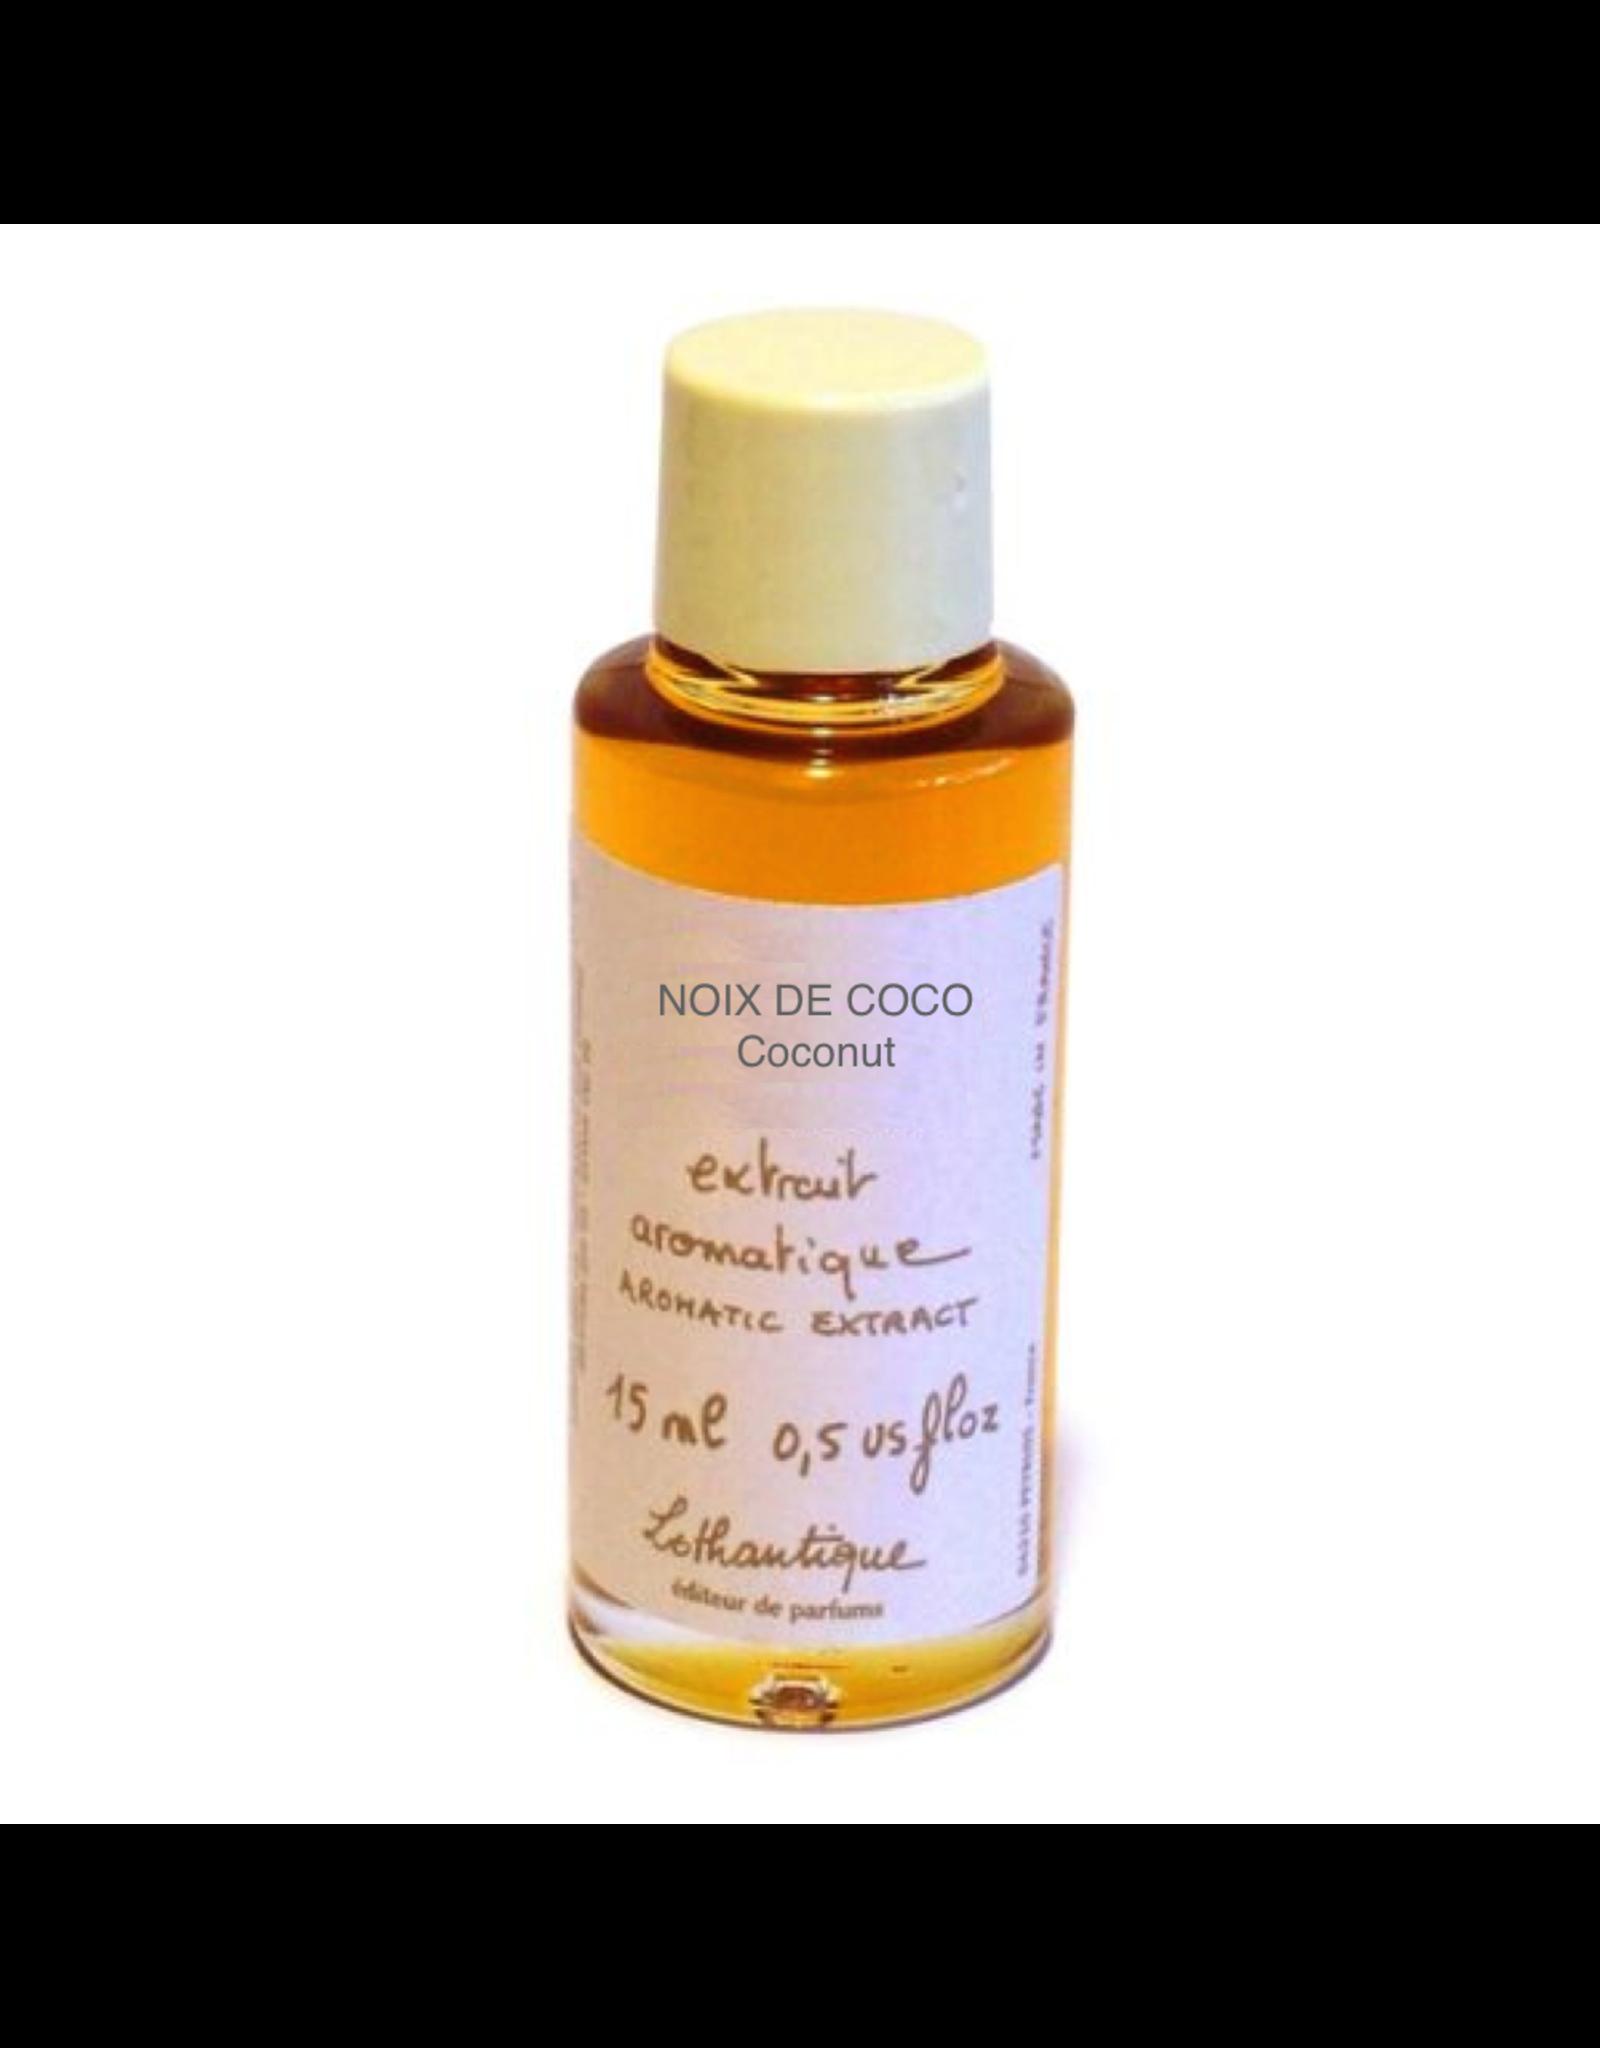 Lothantique Aromatic Extract Essential Perfume Oil 15ml Coconut